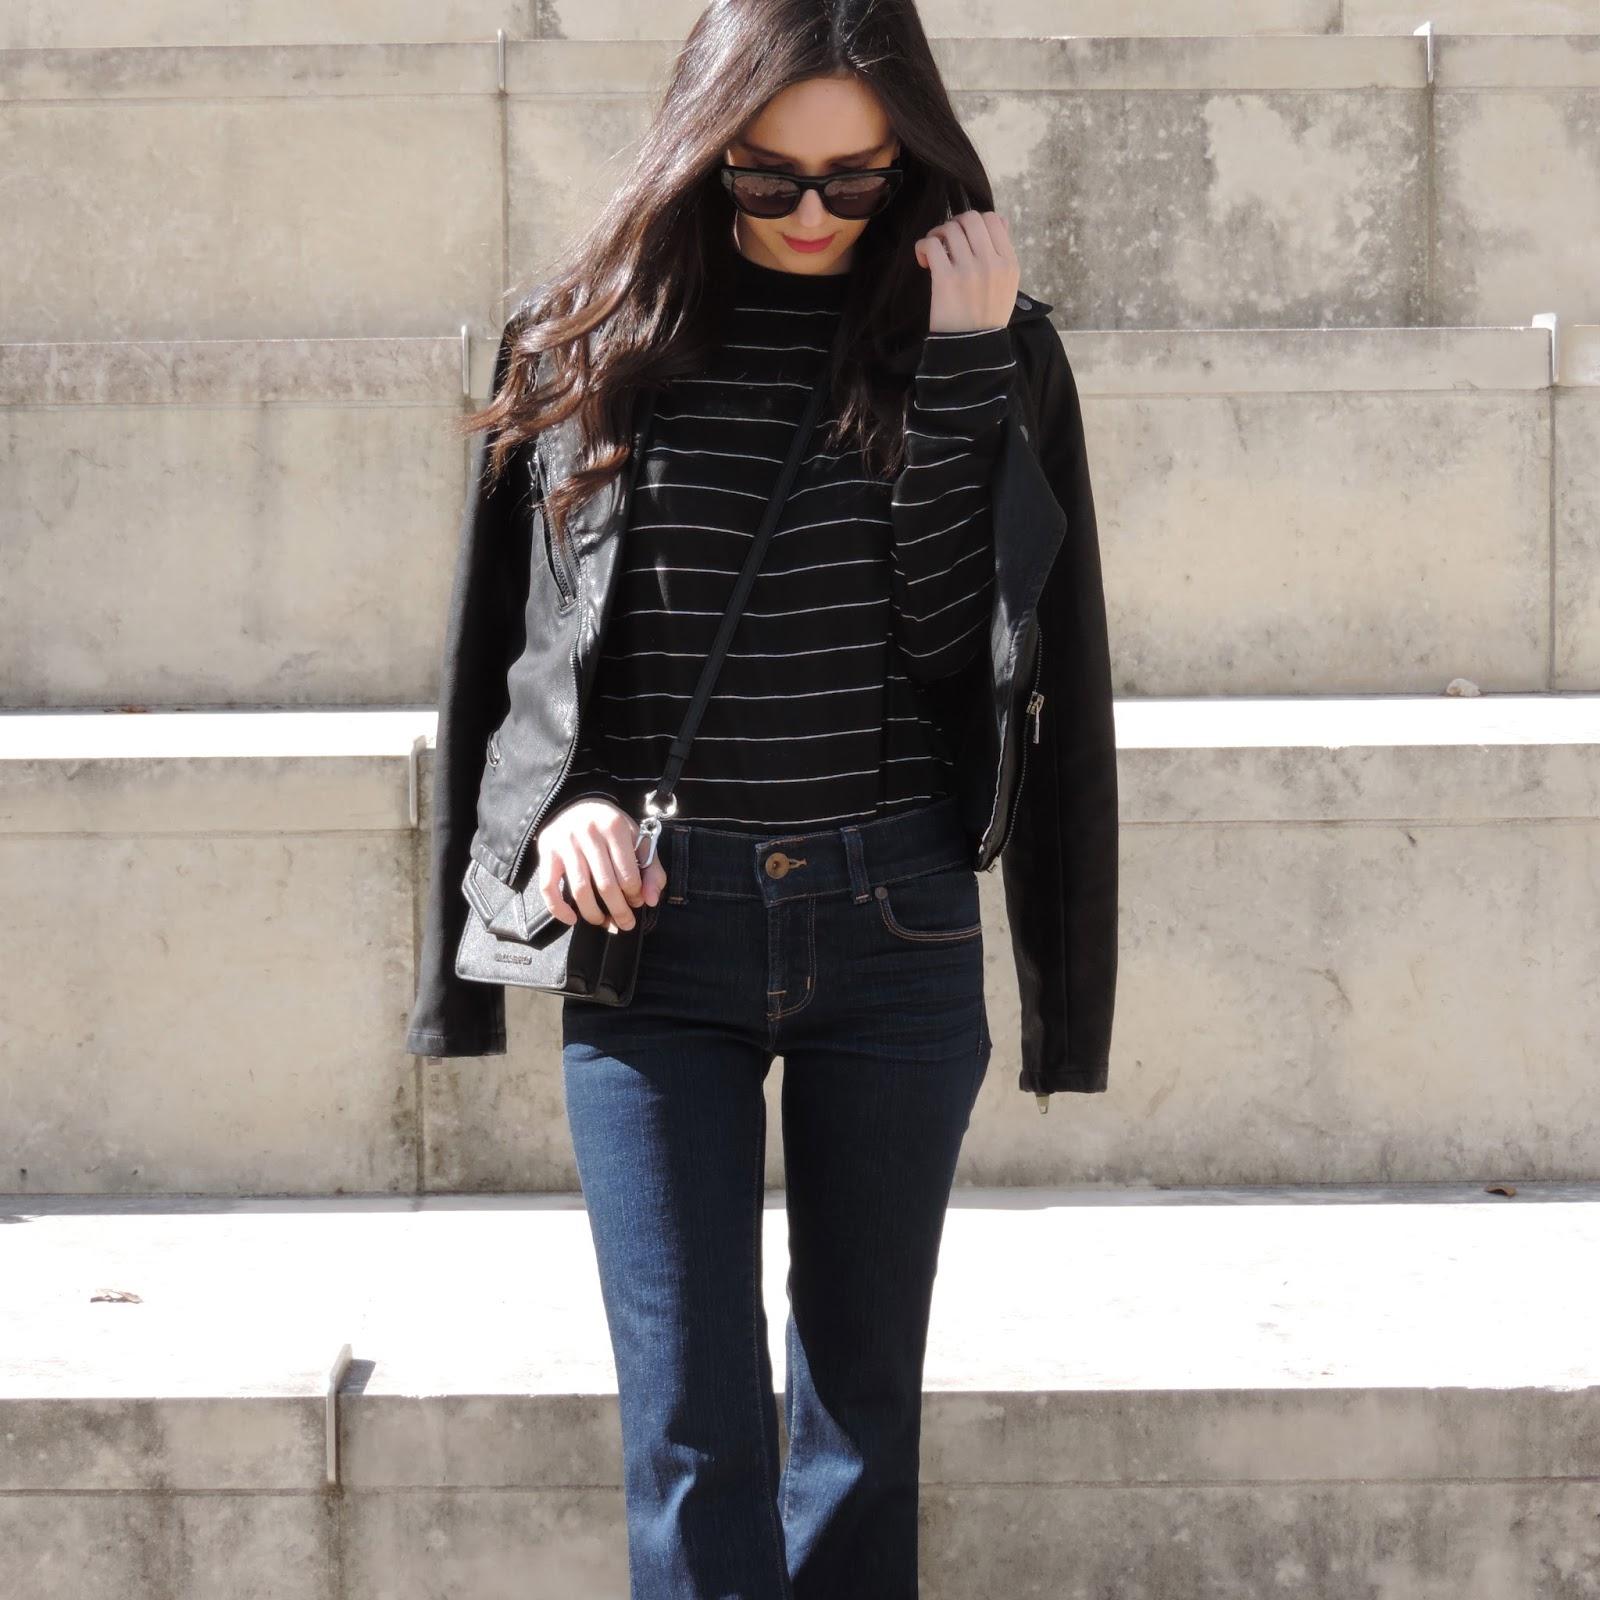 Austin Fashion Blogger